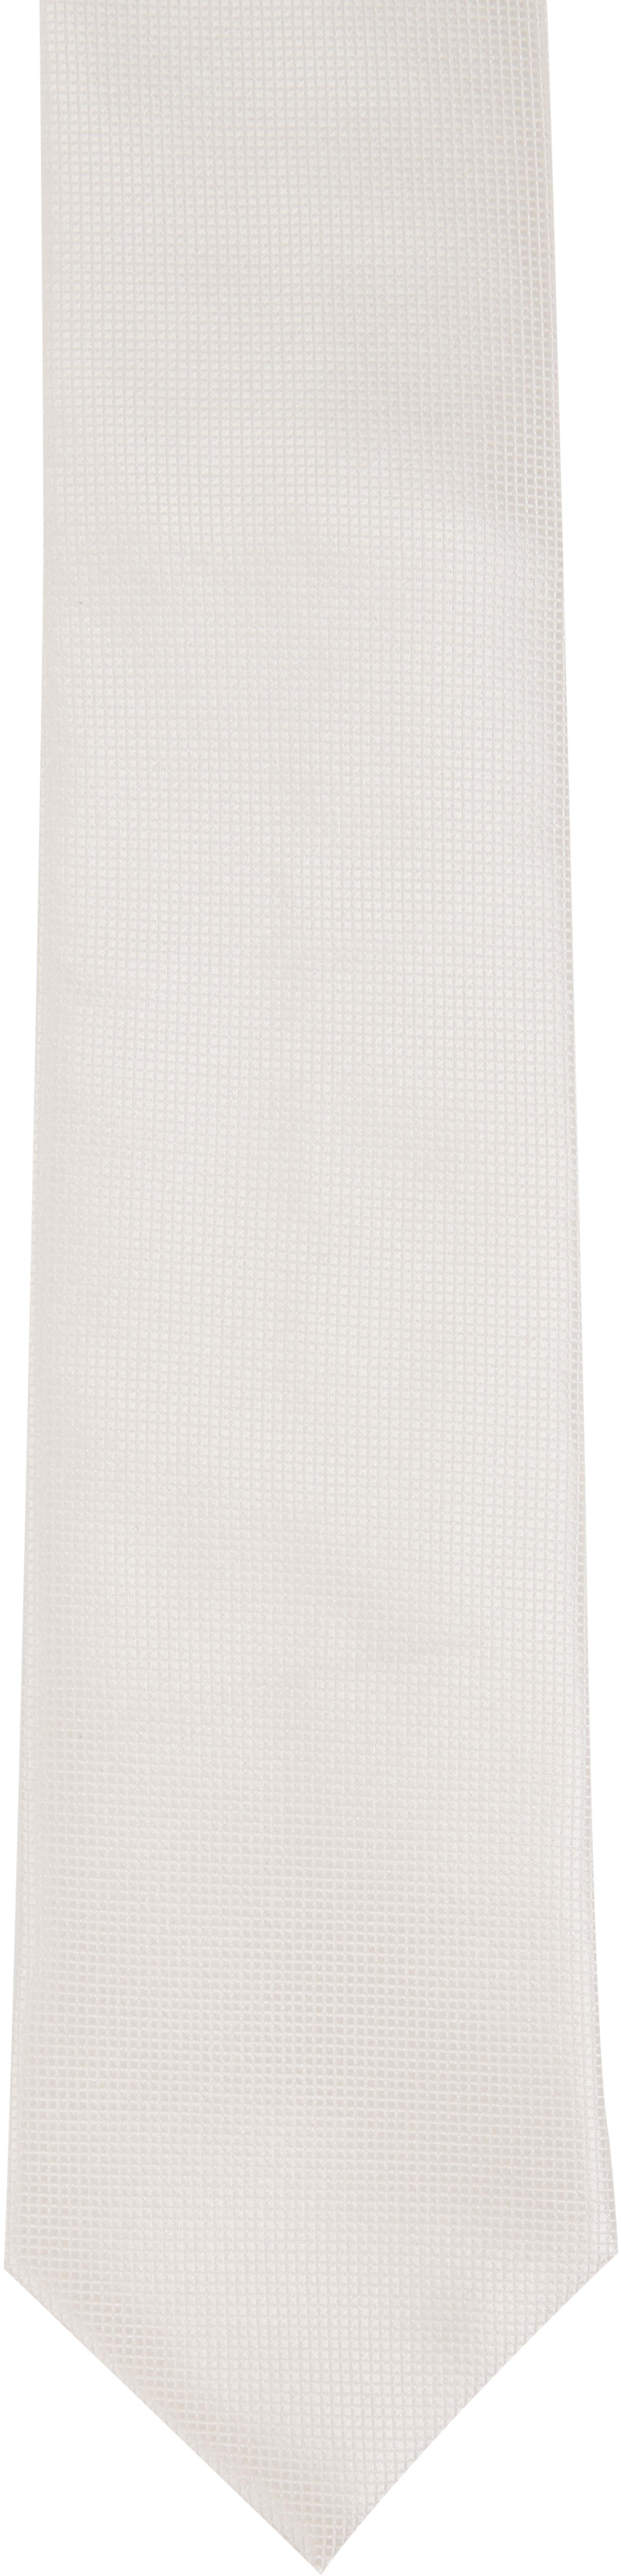 Wedding Tie + Pocketsquare Off-white foto 2